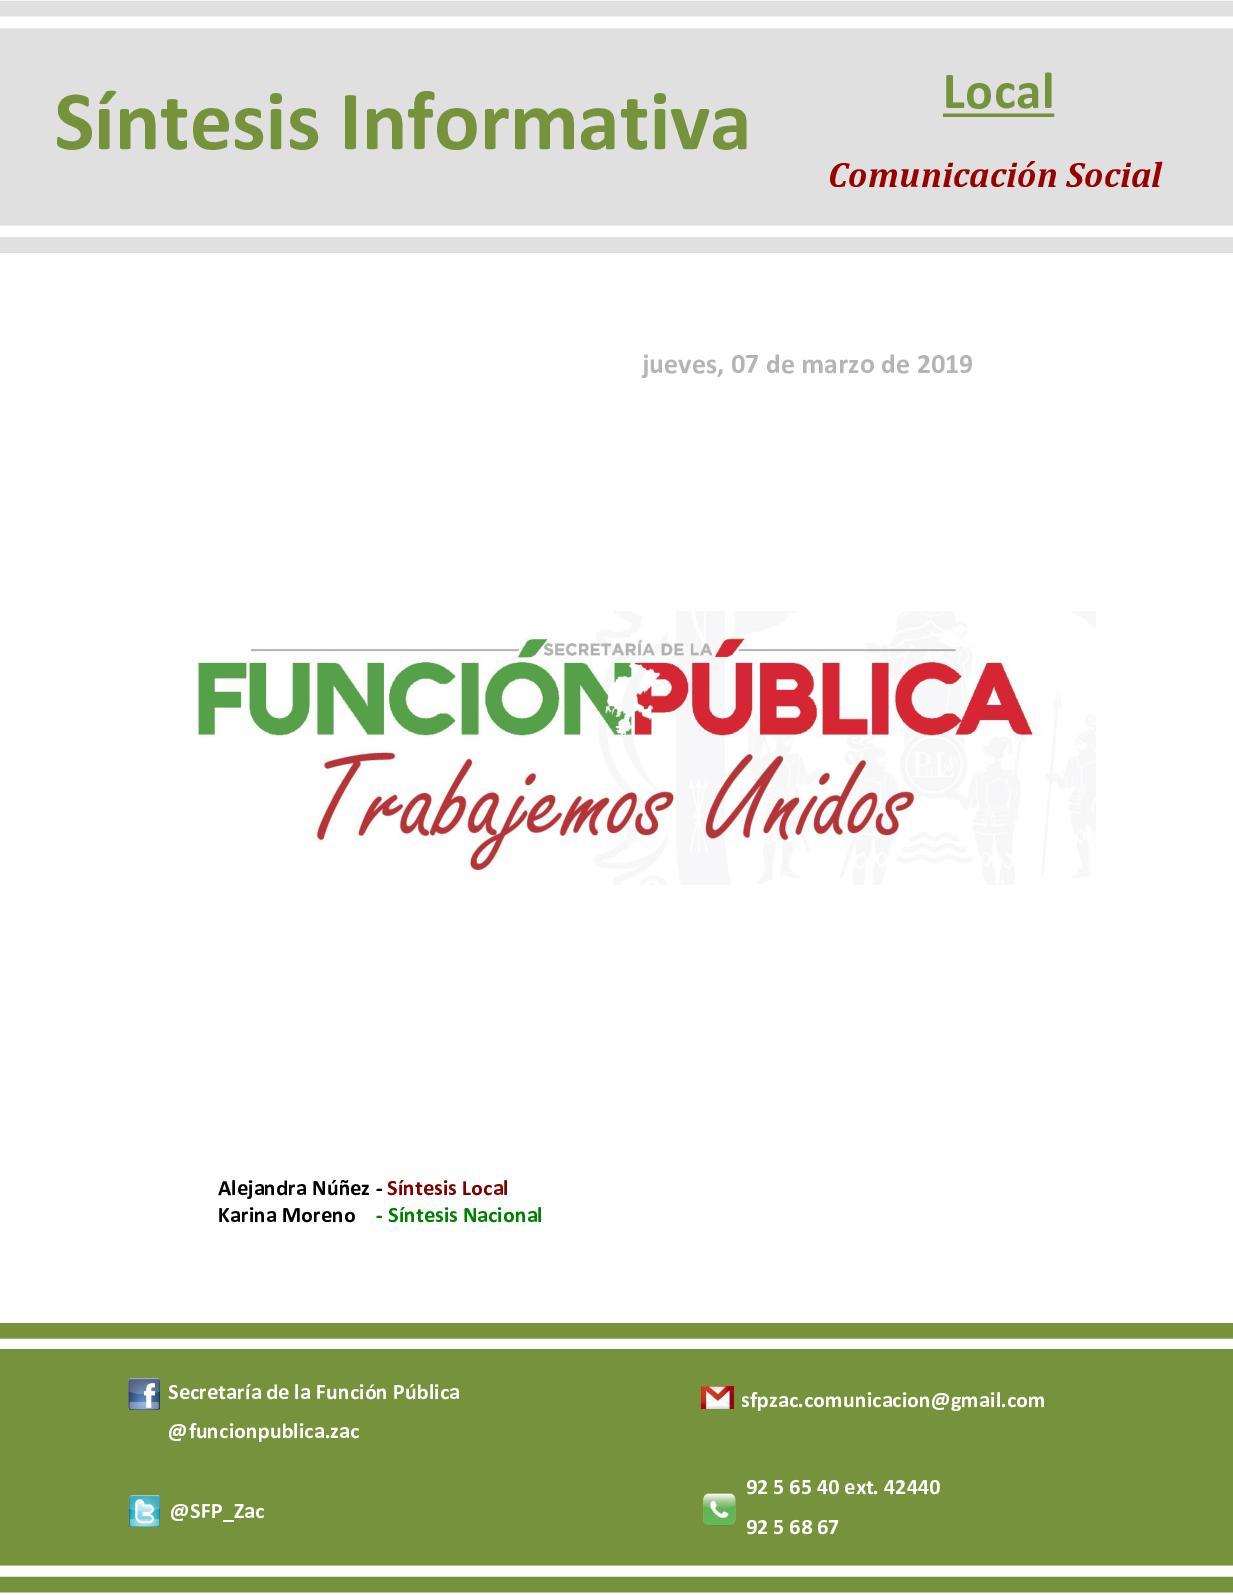 Síntesis Local-Nacional de Comunicación Social de la SFP 07-03-2019